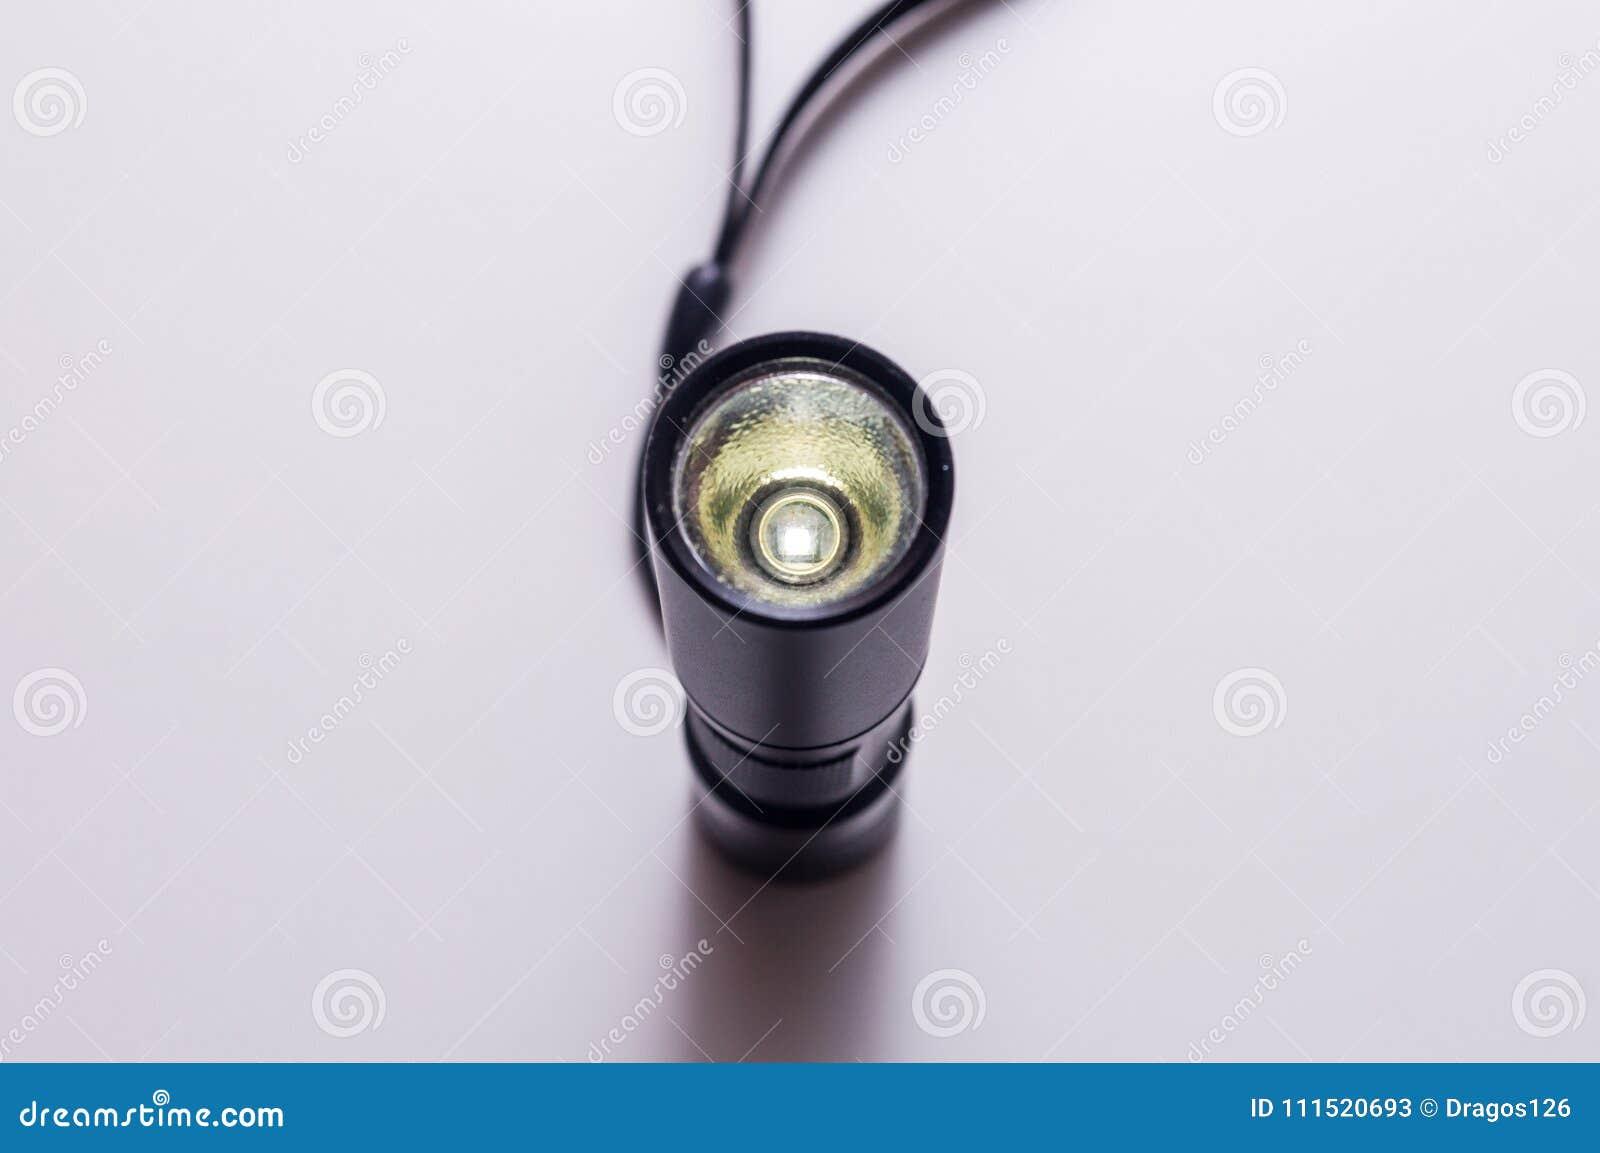 LED aluminium flashlight. Black torch.